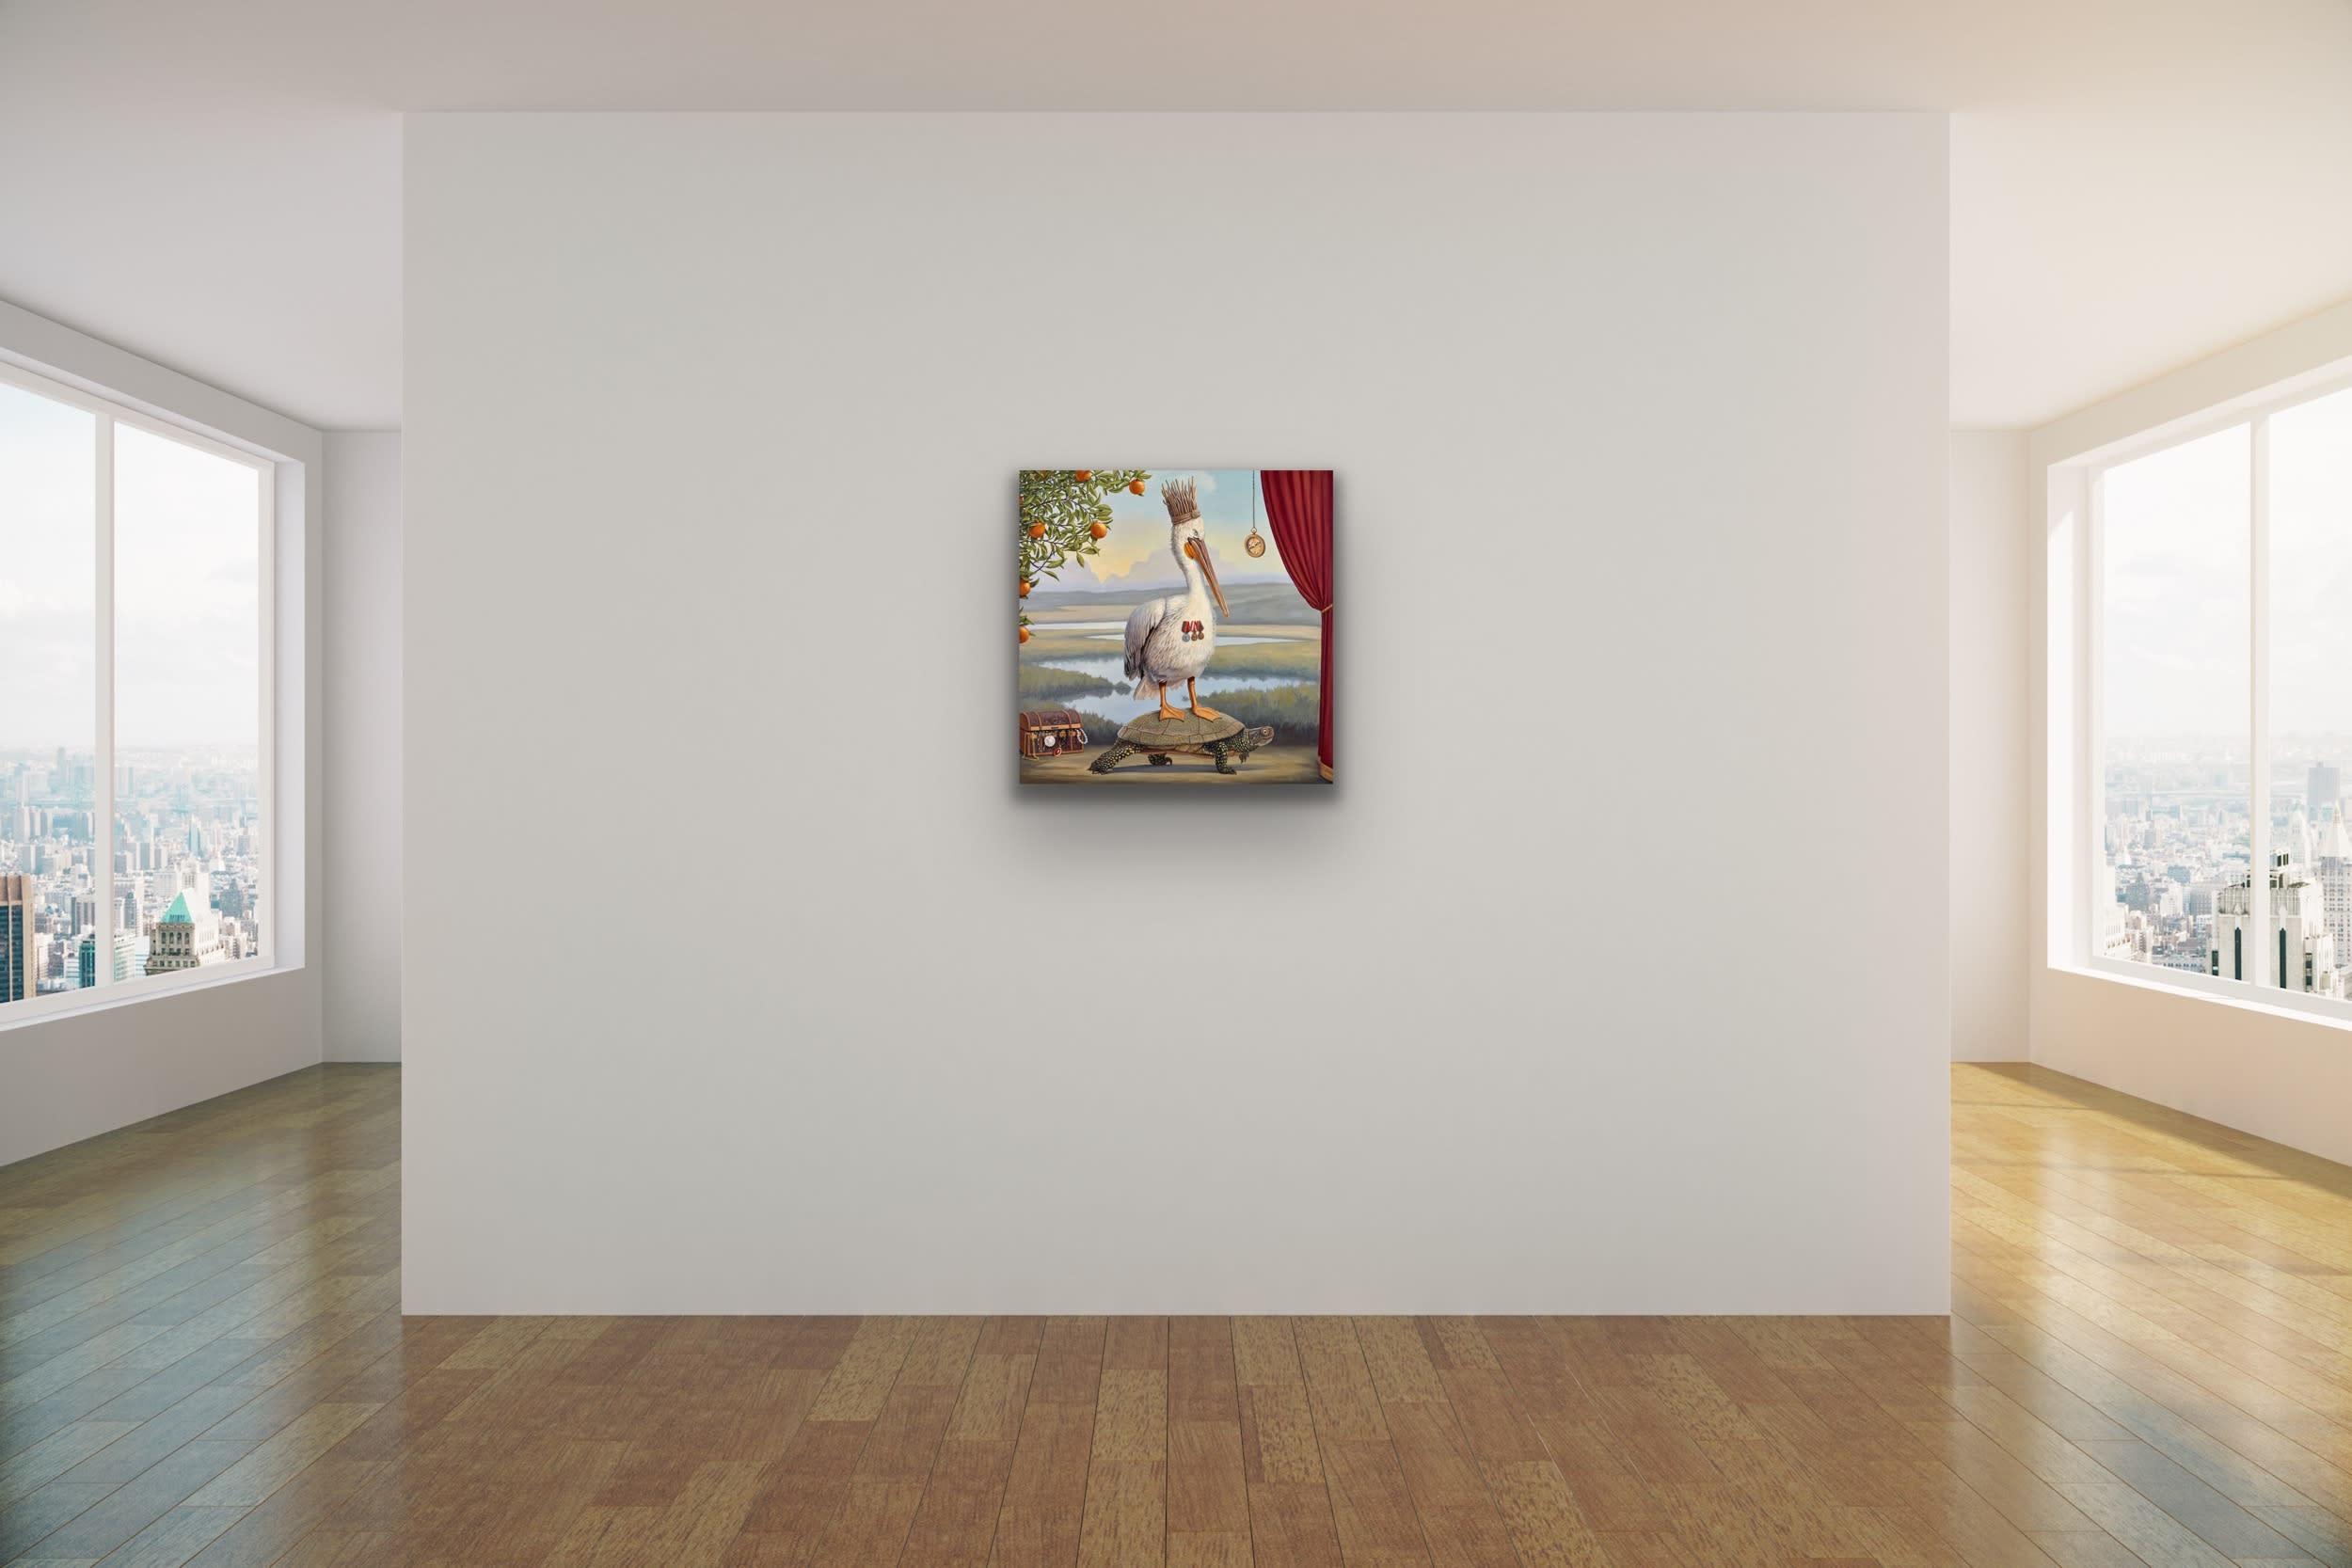 <div class='title'>           Paul Bond   Magical Surreal Absurd Art Vladimir Kush Michael Cheval Dali Evo Art Maui 9         </div>